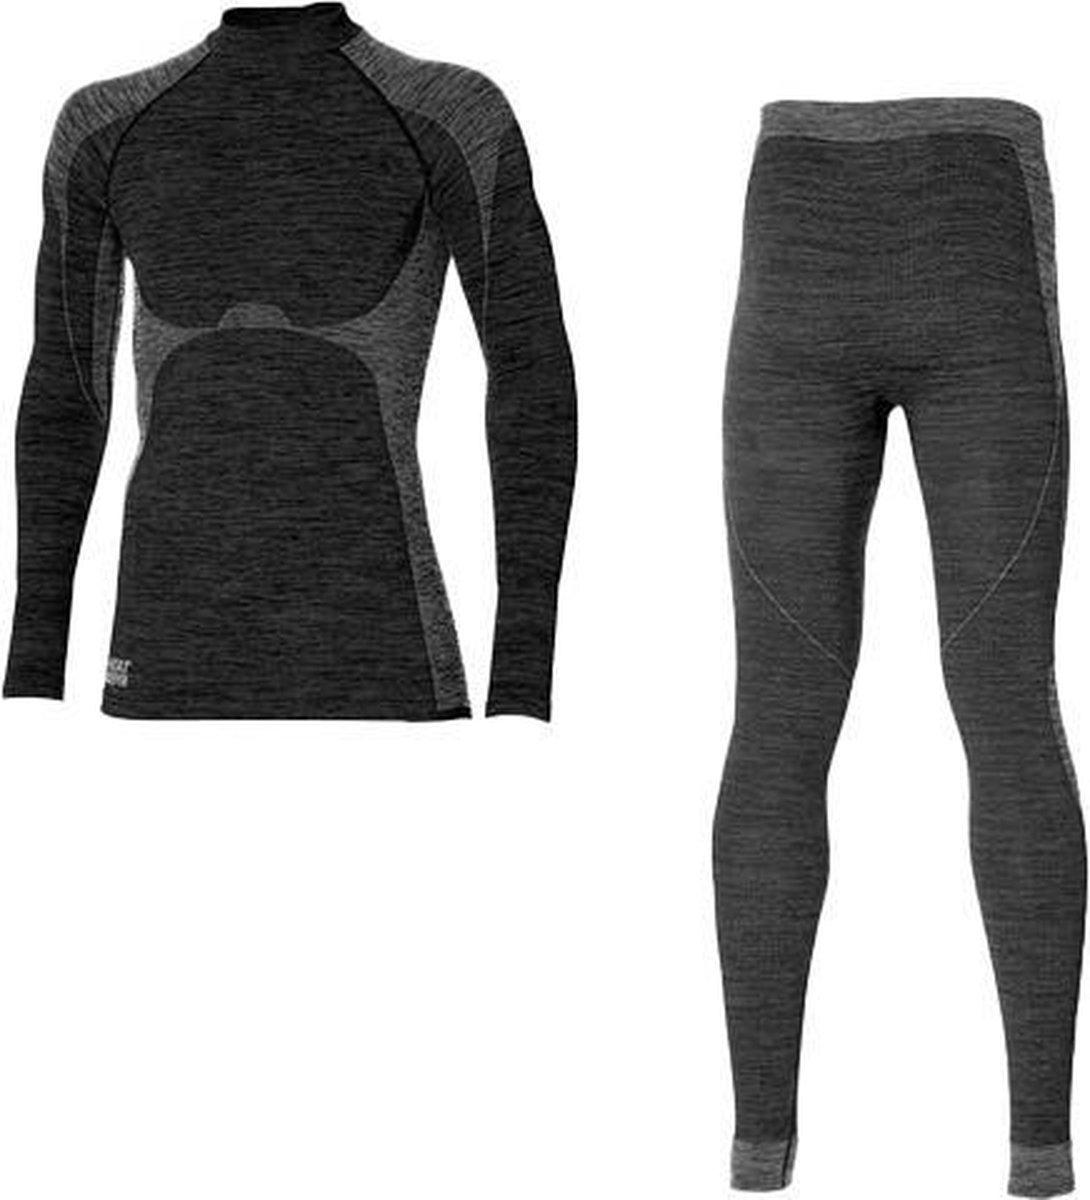 Premium thermokleding - Type: Heren, maat L - Broek en shirt - Thermoset